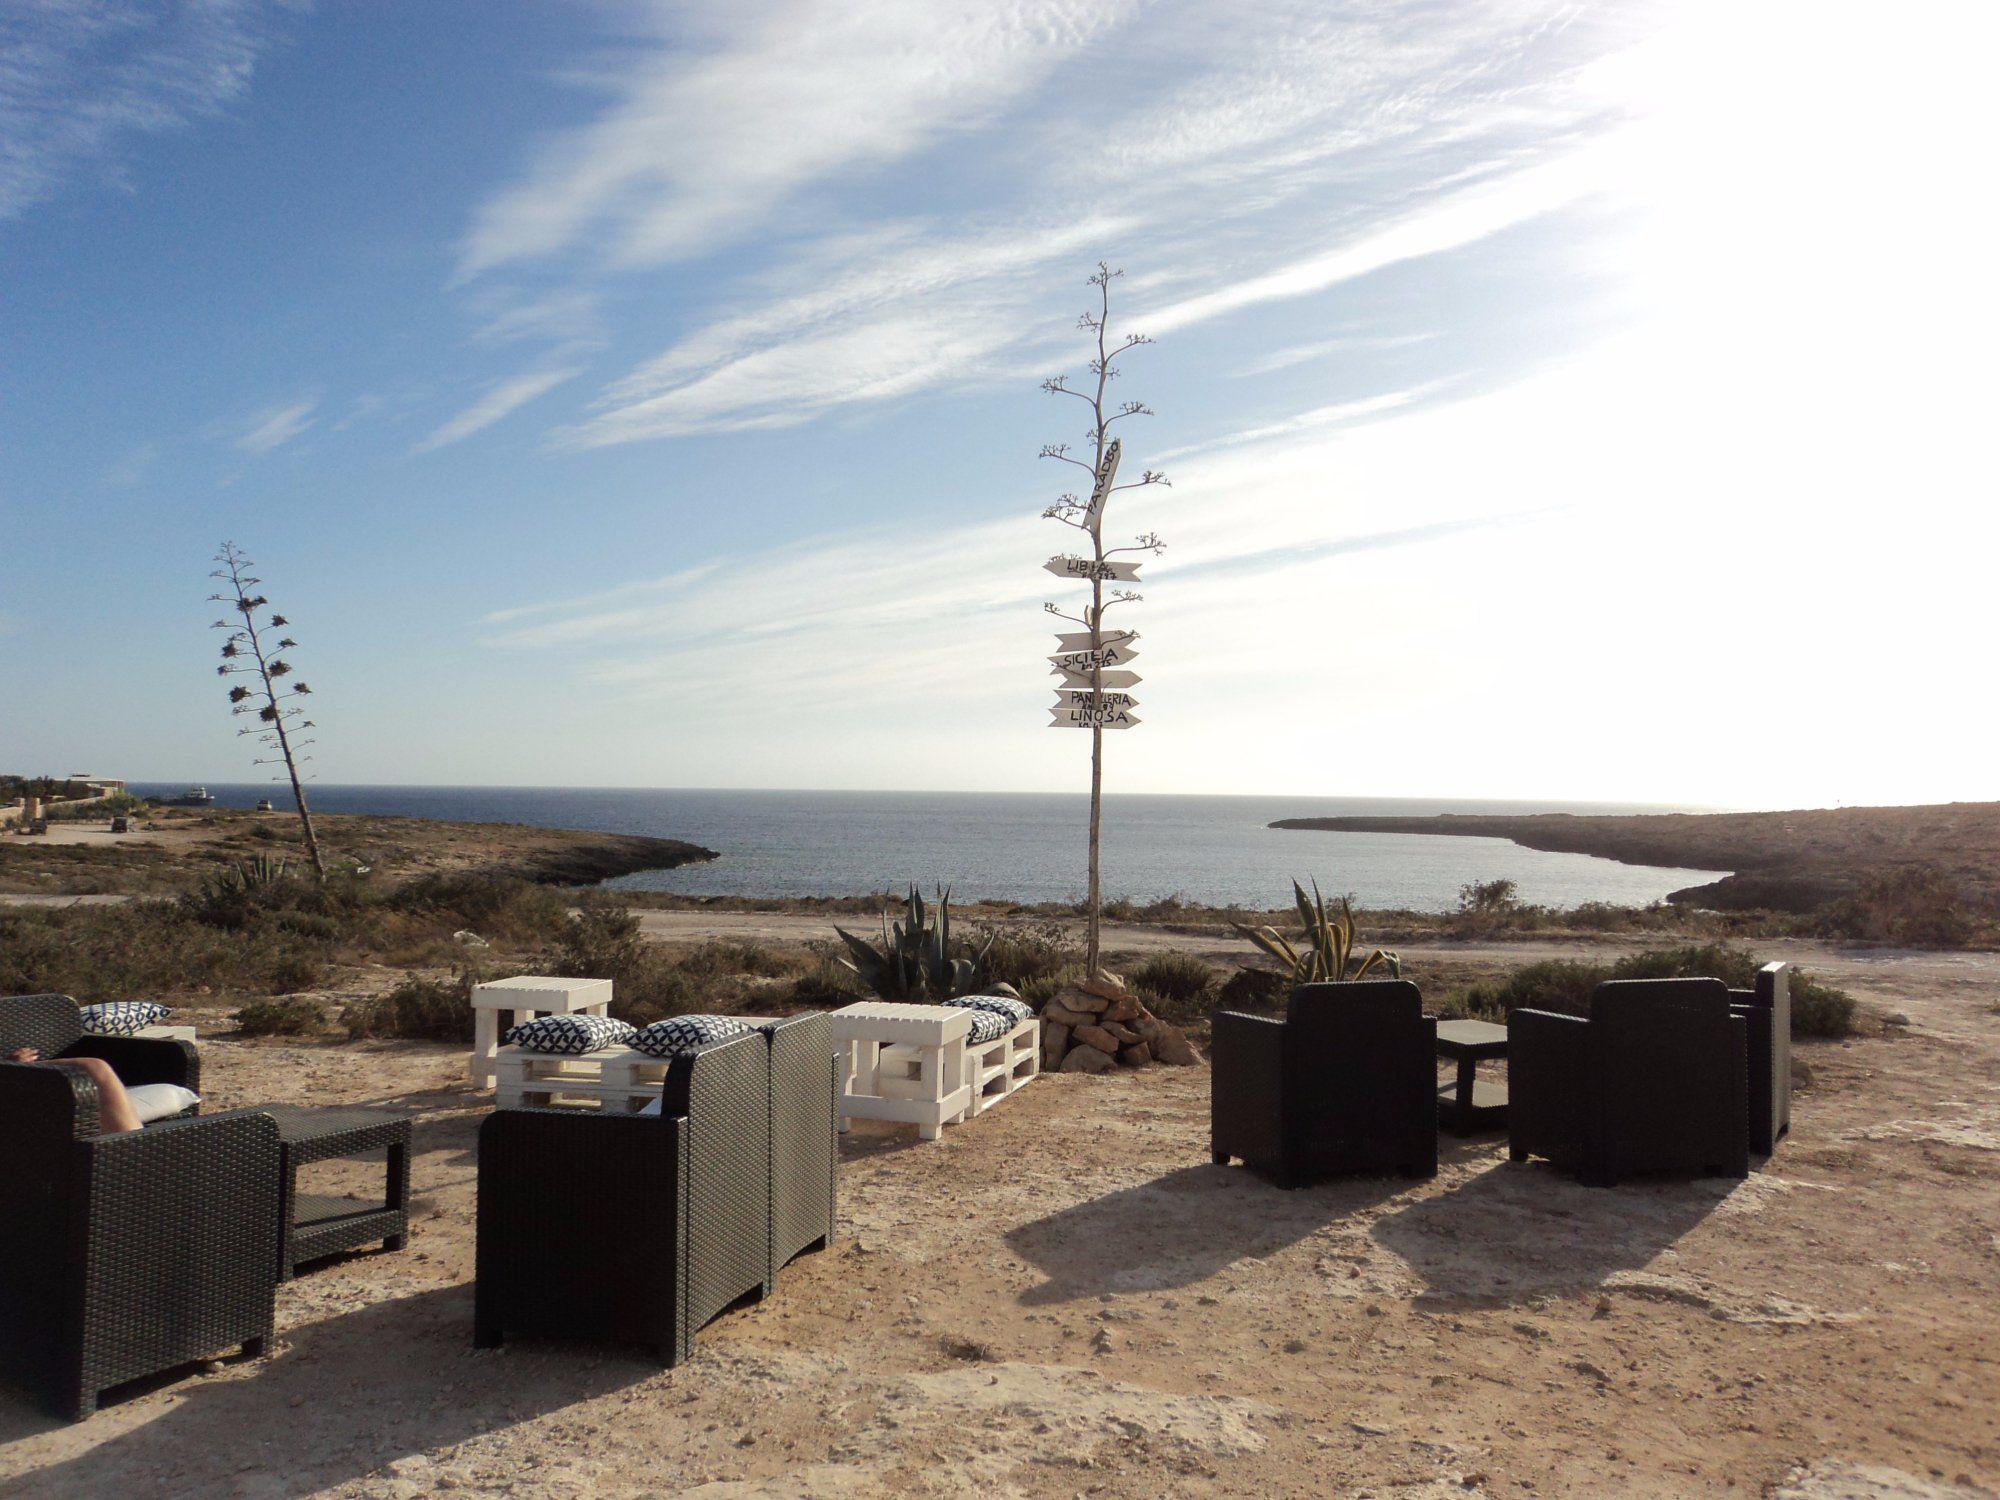 Matrimonio In Spiaggia Lampedusa : Matrimonio in spiaggia recensioni su ristorante portu ntoni